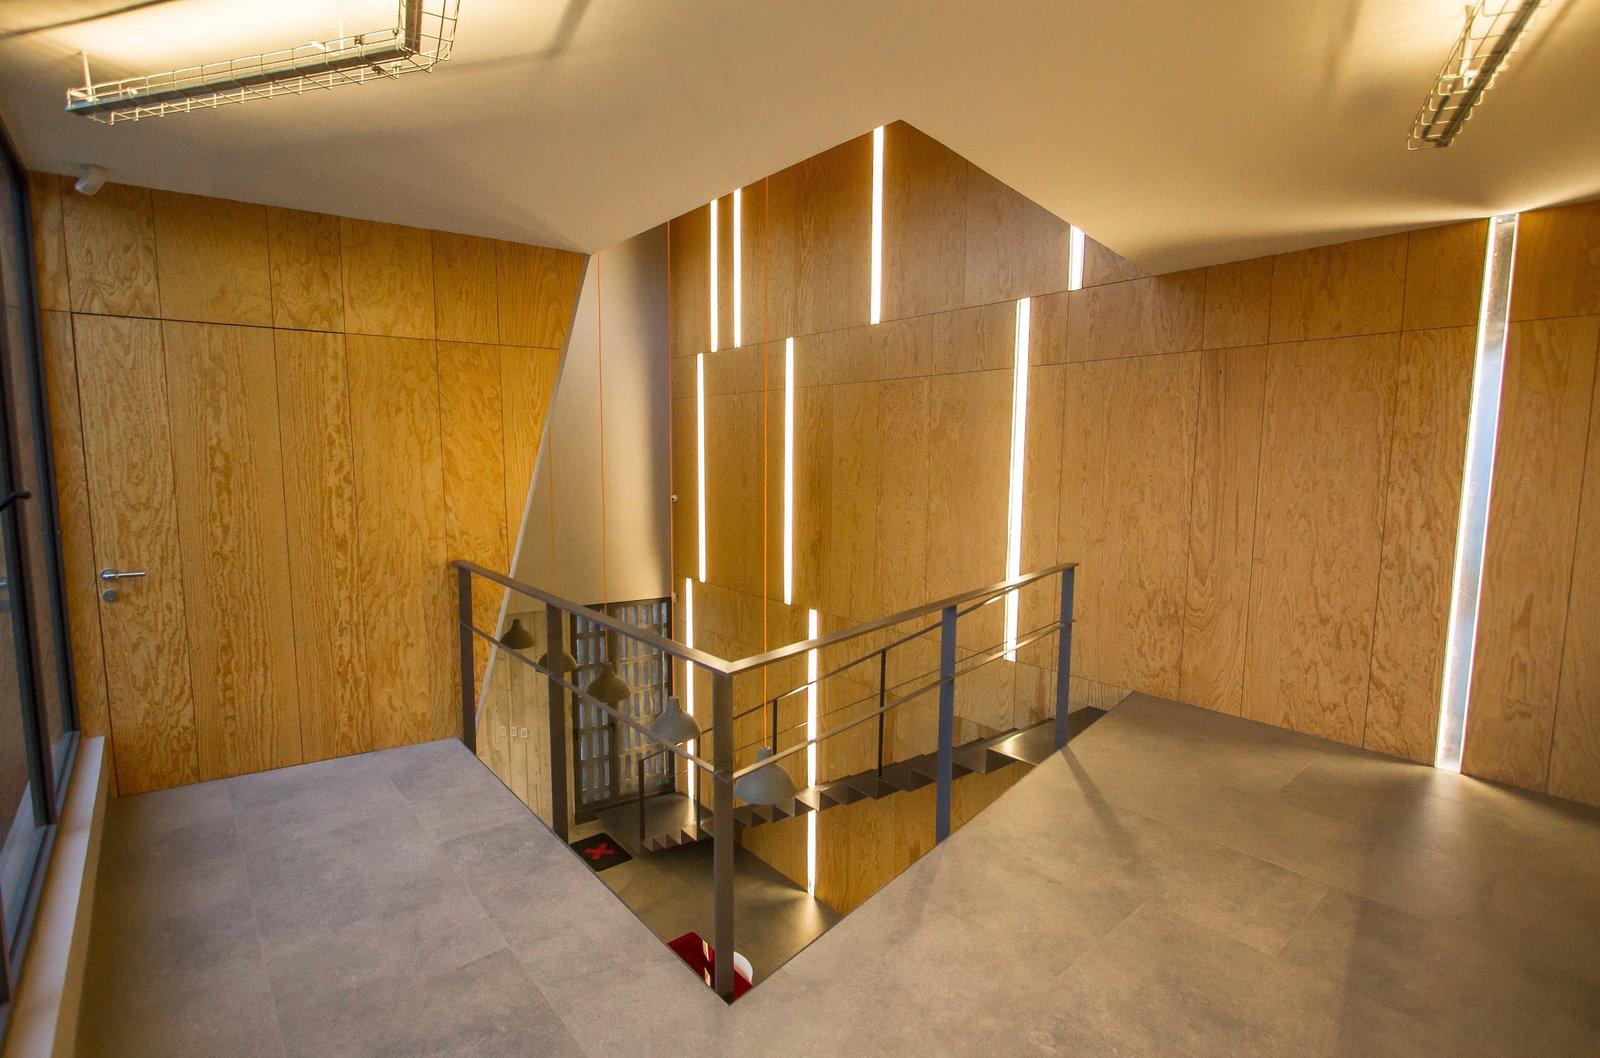 Hallway and Ceramic Tile Floor  CASA HOST by Claudia PCampos